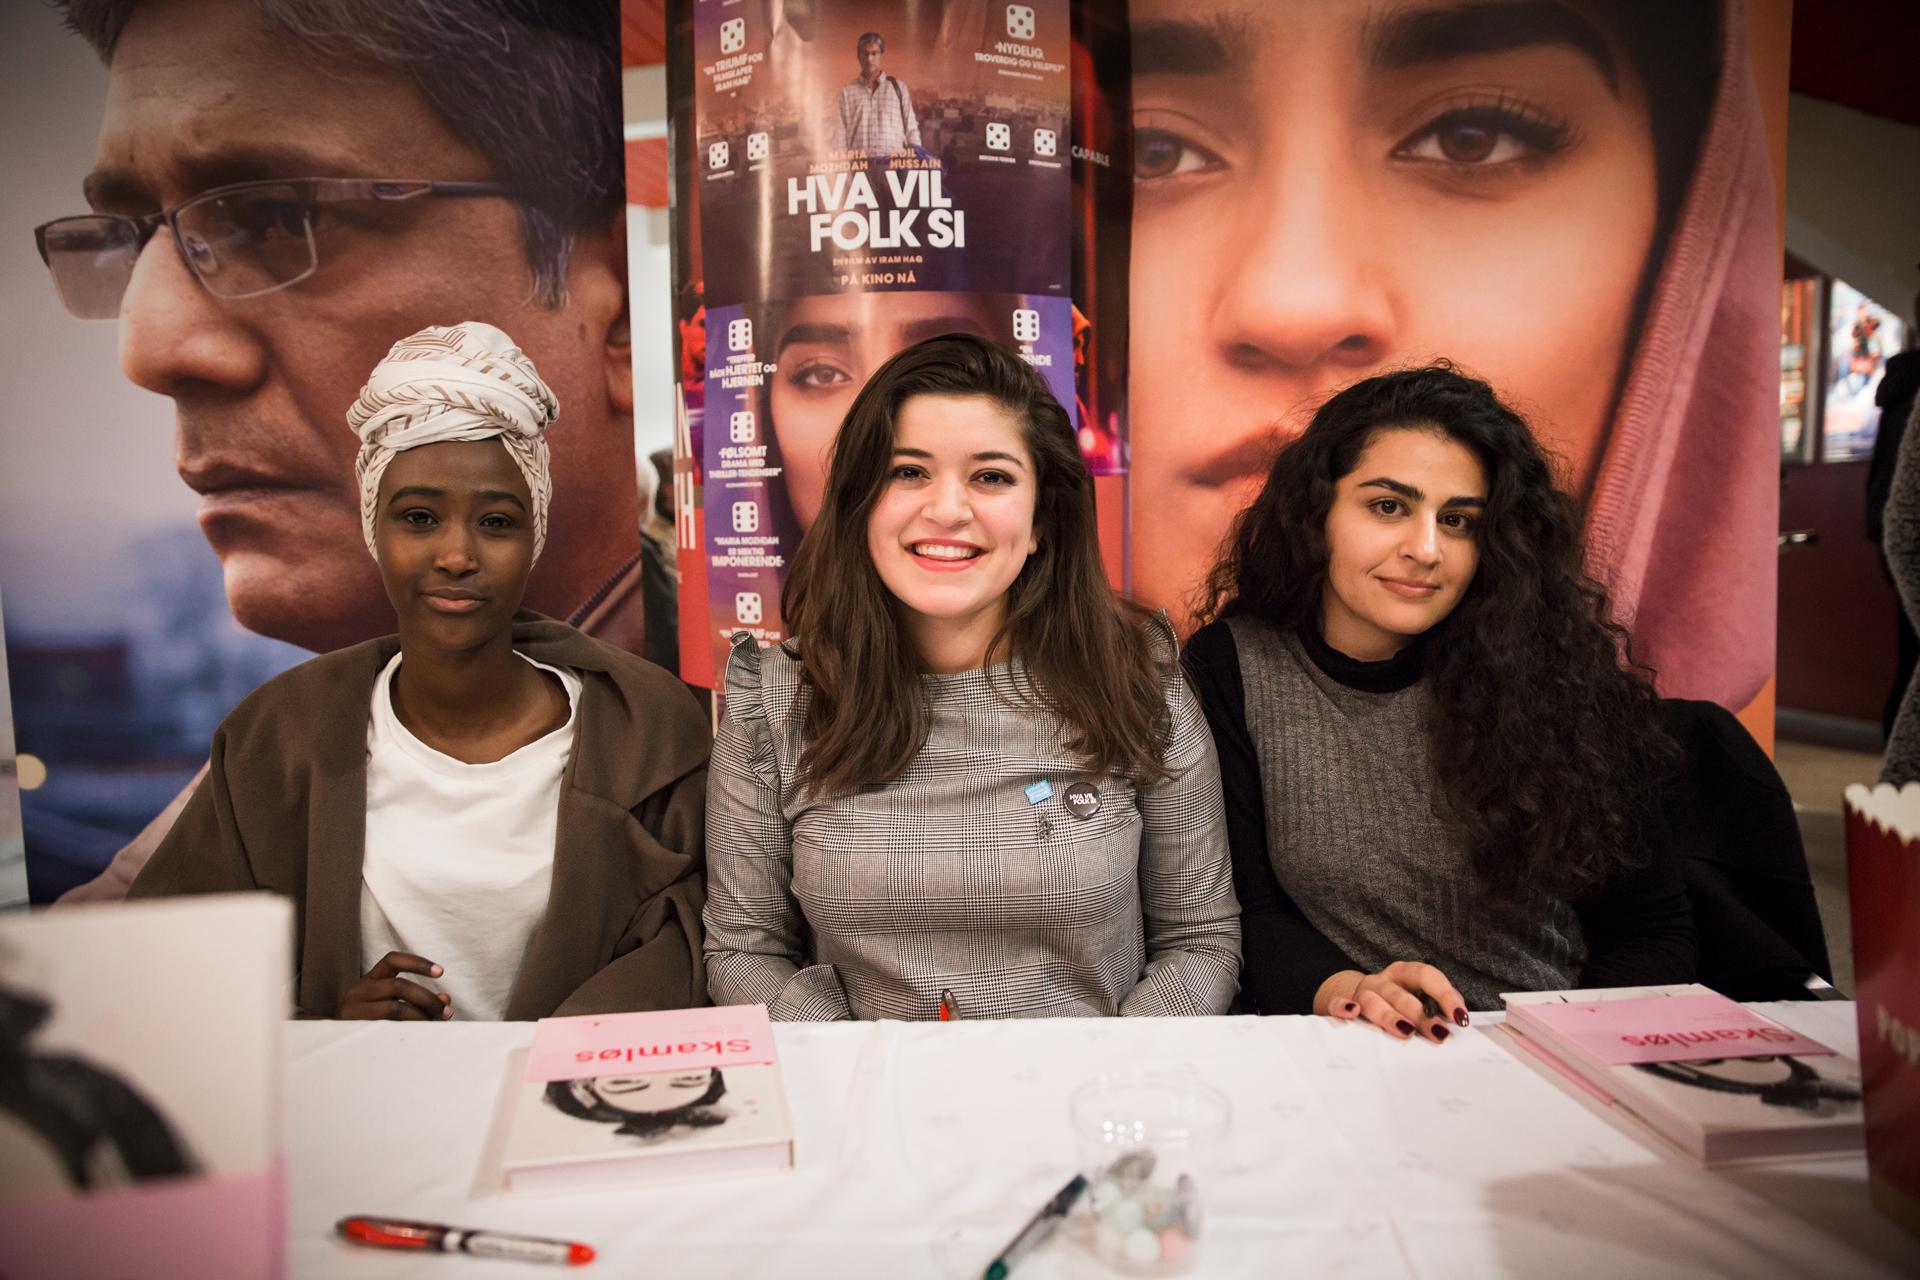 Skamløs-forfatterne Amina Bile, Nancy Herz og Sofia Nesrine Srour signerte den rykende ferske boka si i foajeen på Saga kino i forbindelse med jentevisningen. Foto: Solveig Bakken